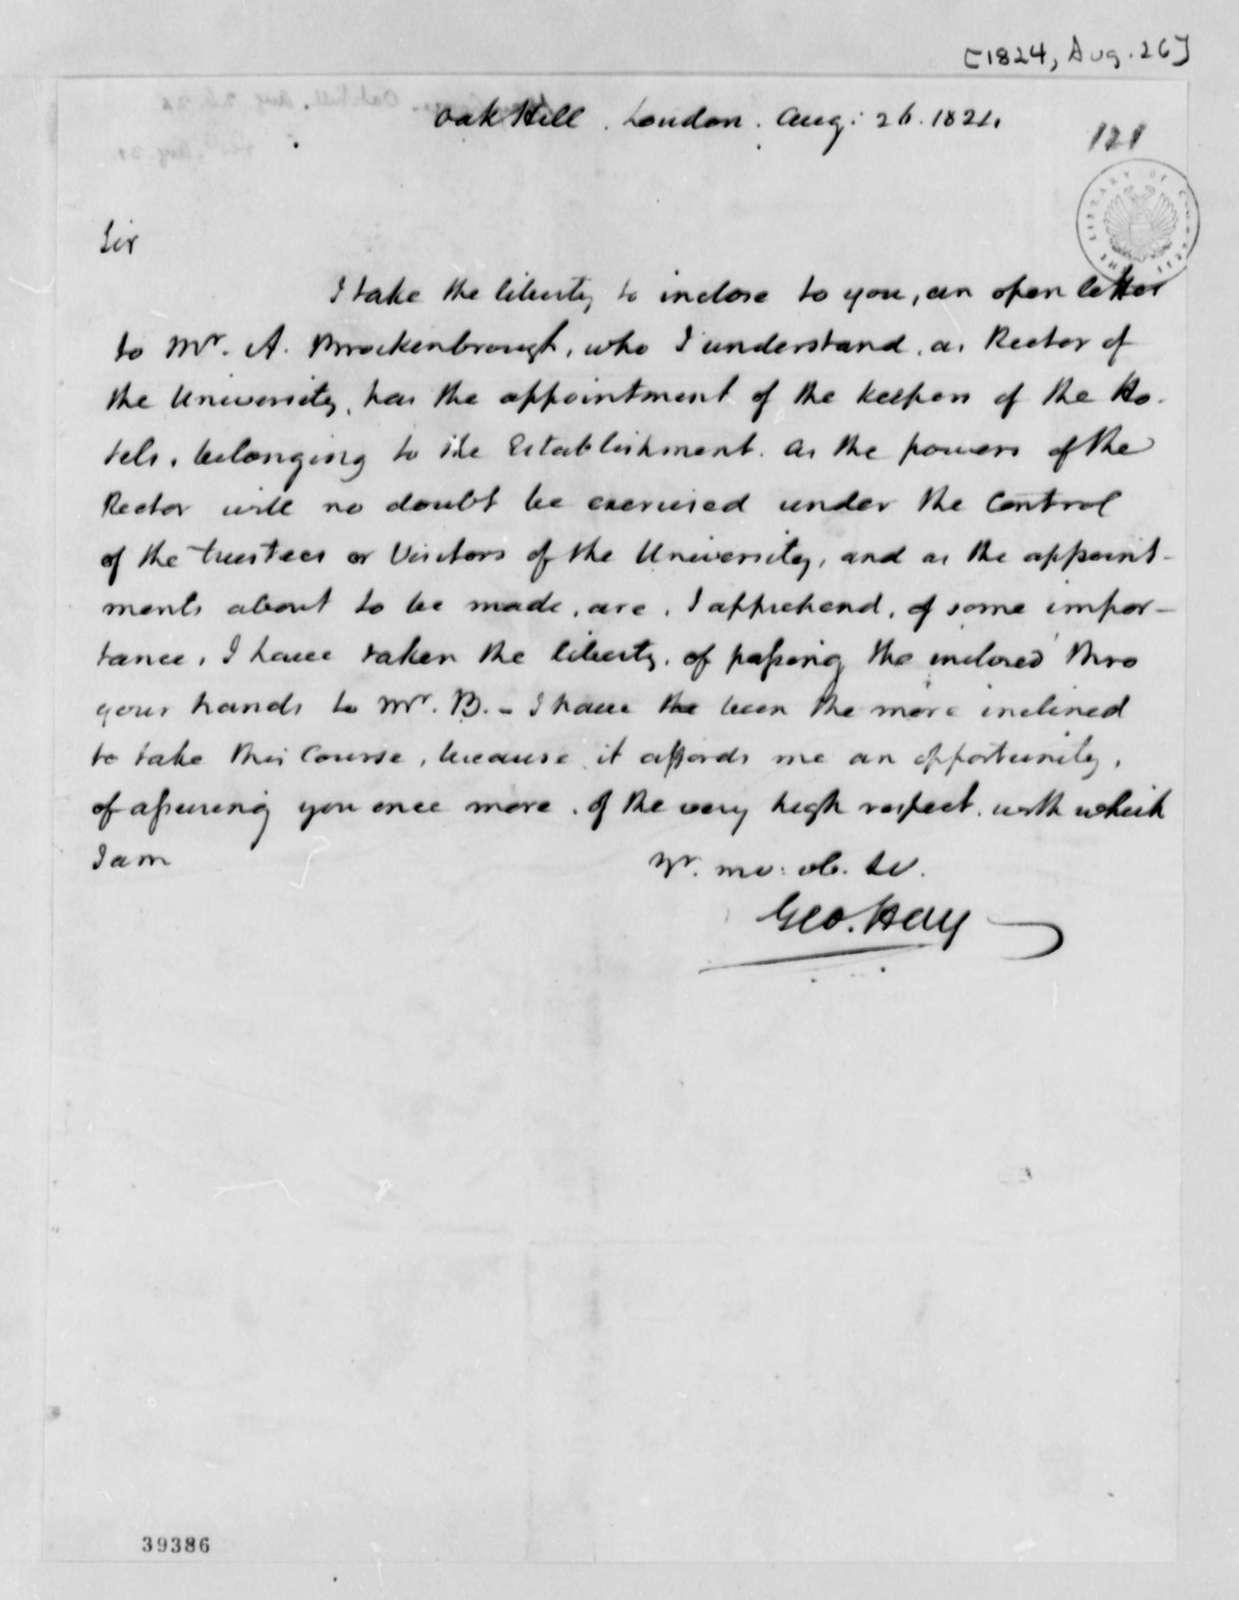 George Hay to Thomas Jefferson, August 26, 1824